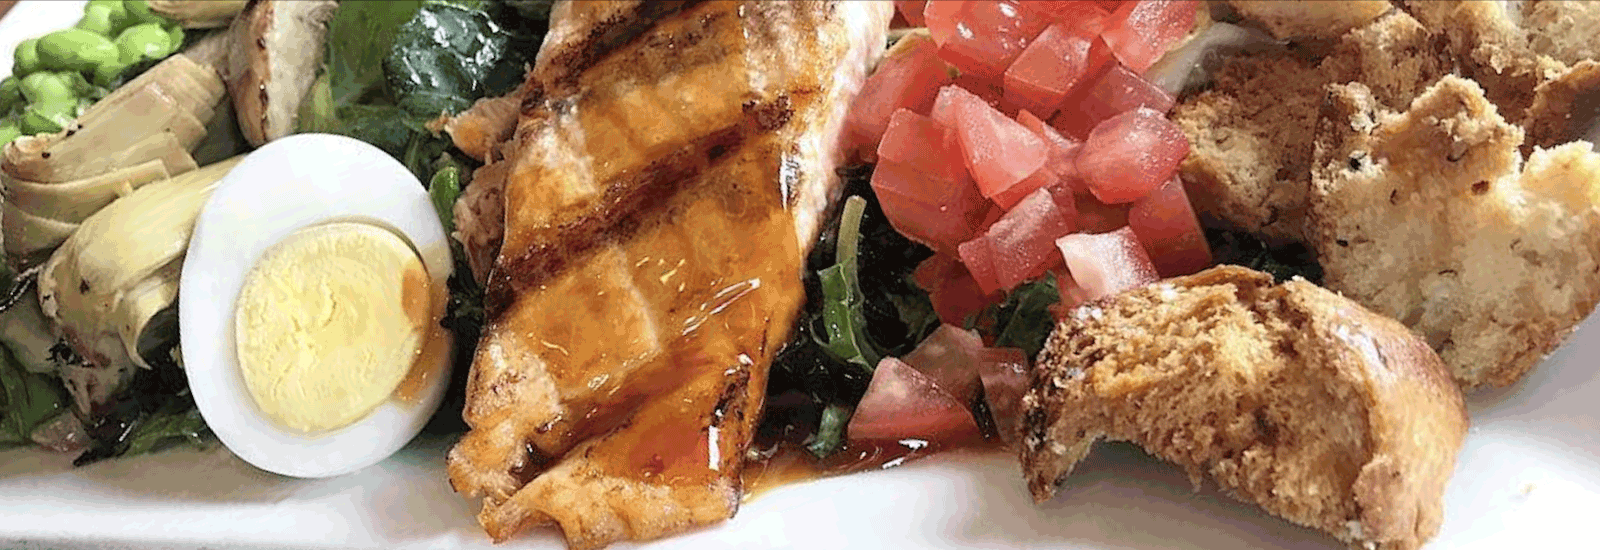 International Cuisine near Westover ARB